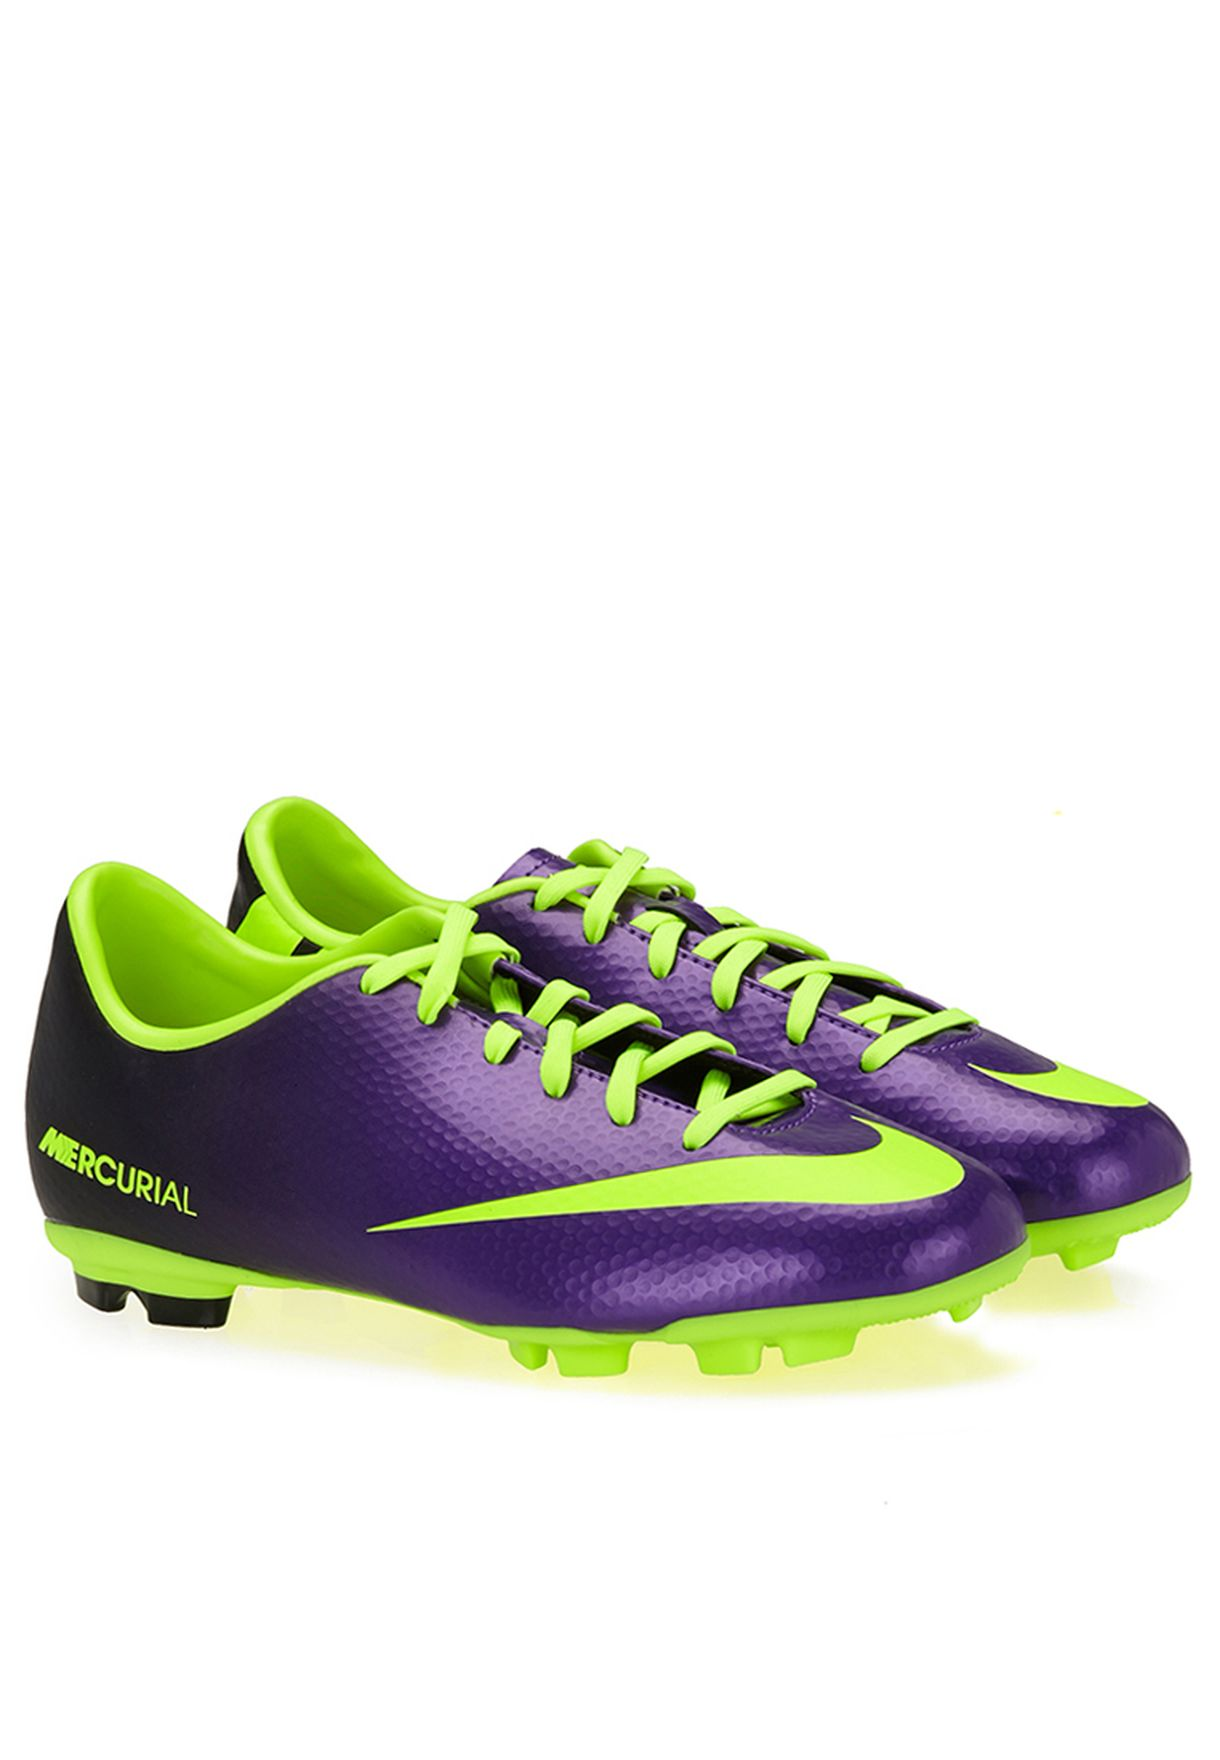 c2d074a51a ... aliexpress shop nike purple mercurial victory iv fg fb boots 553631 570  for kids in bahrain